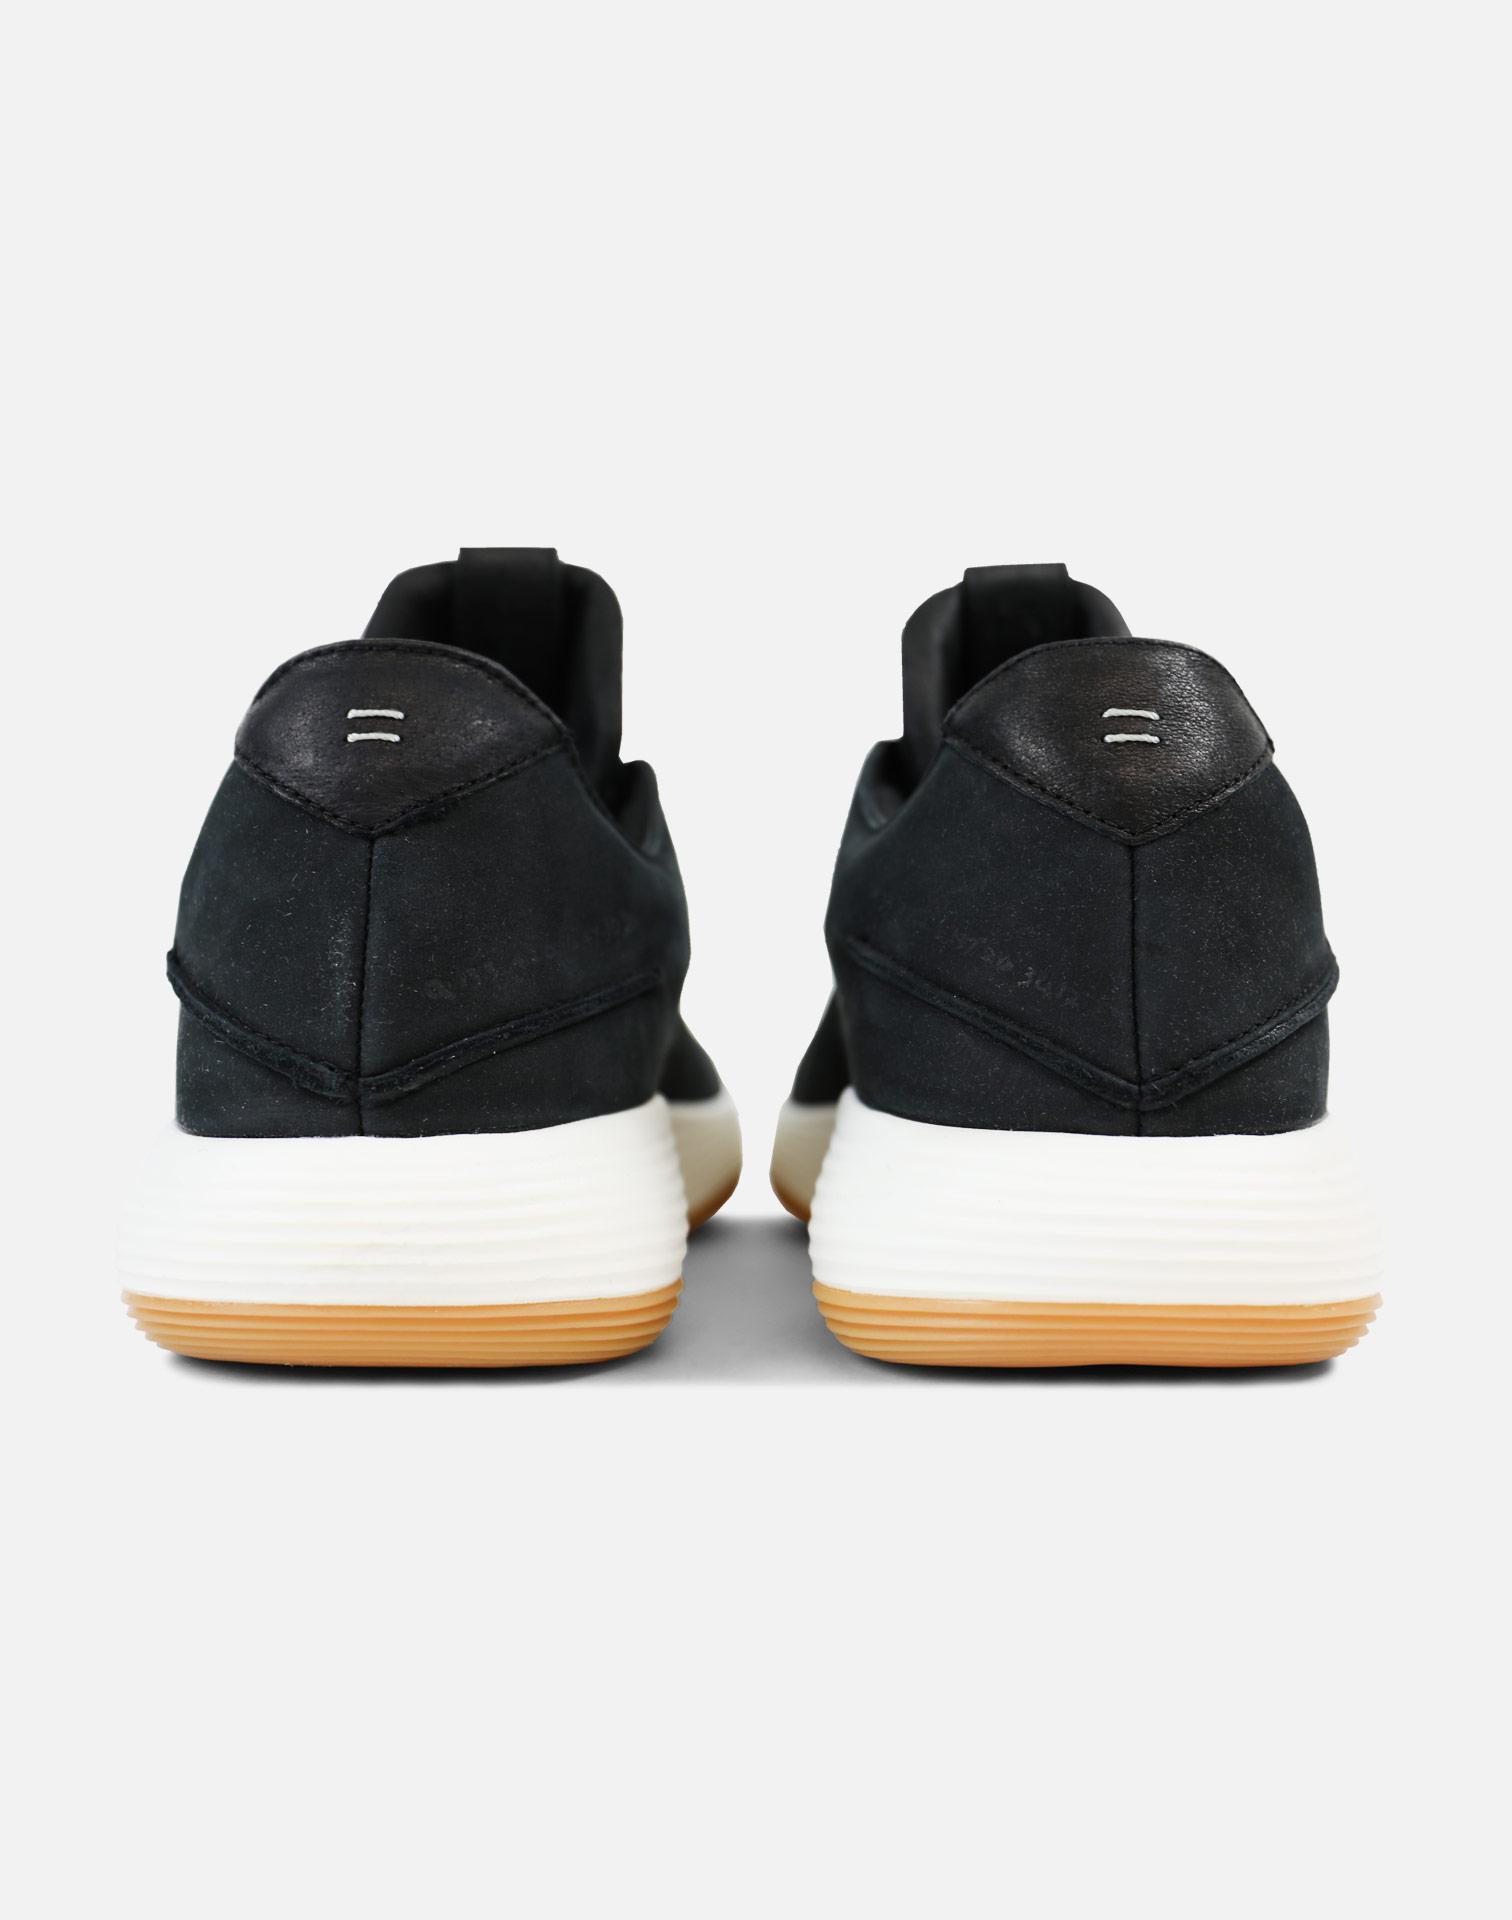 0ed424068e4 ... release info on 3ab80 ee56a Lyst - Nike Hyperdunk 2017 Low Lmtd in  Black for Men ...